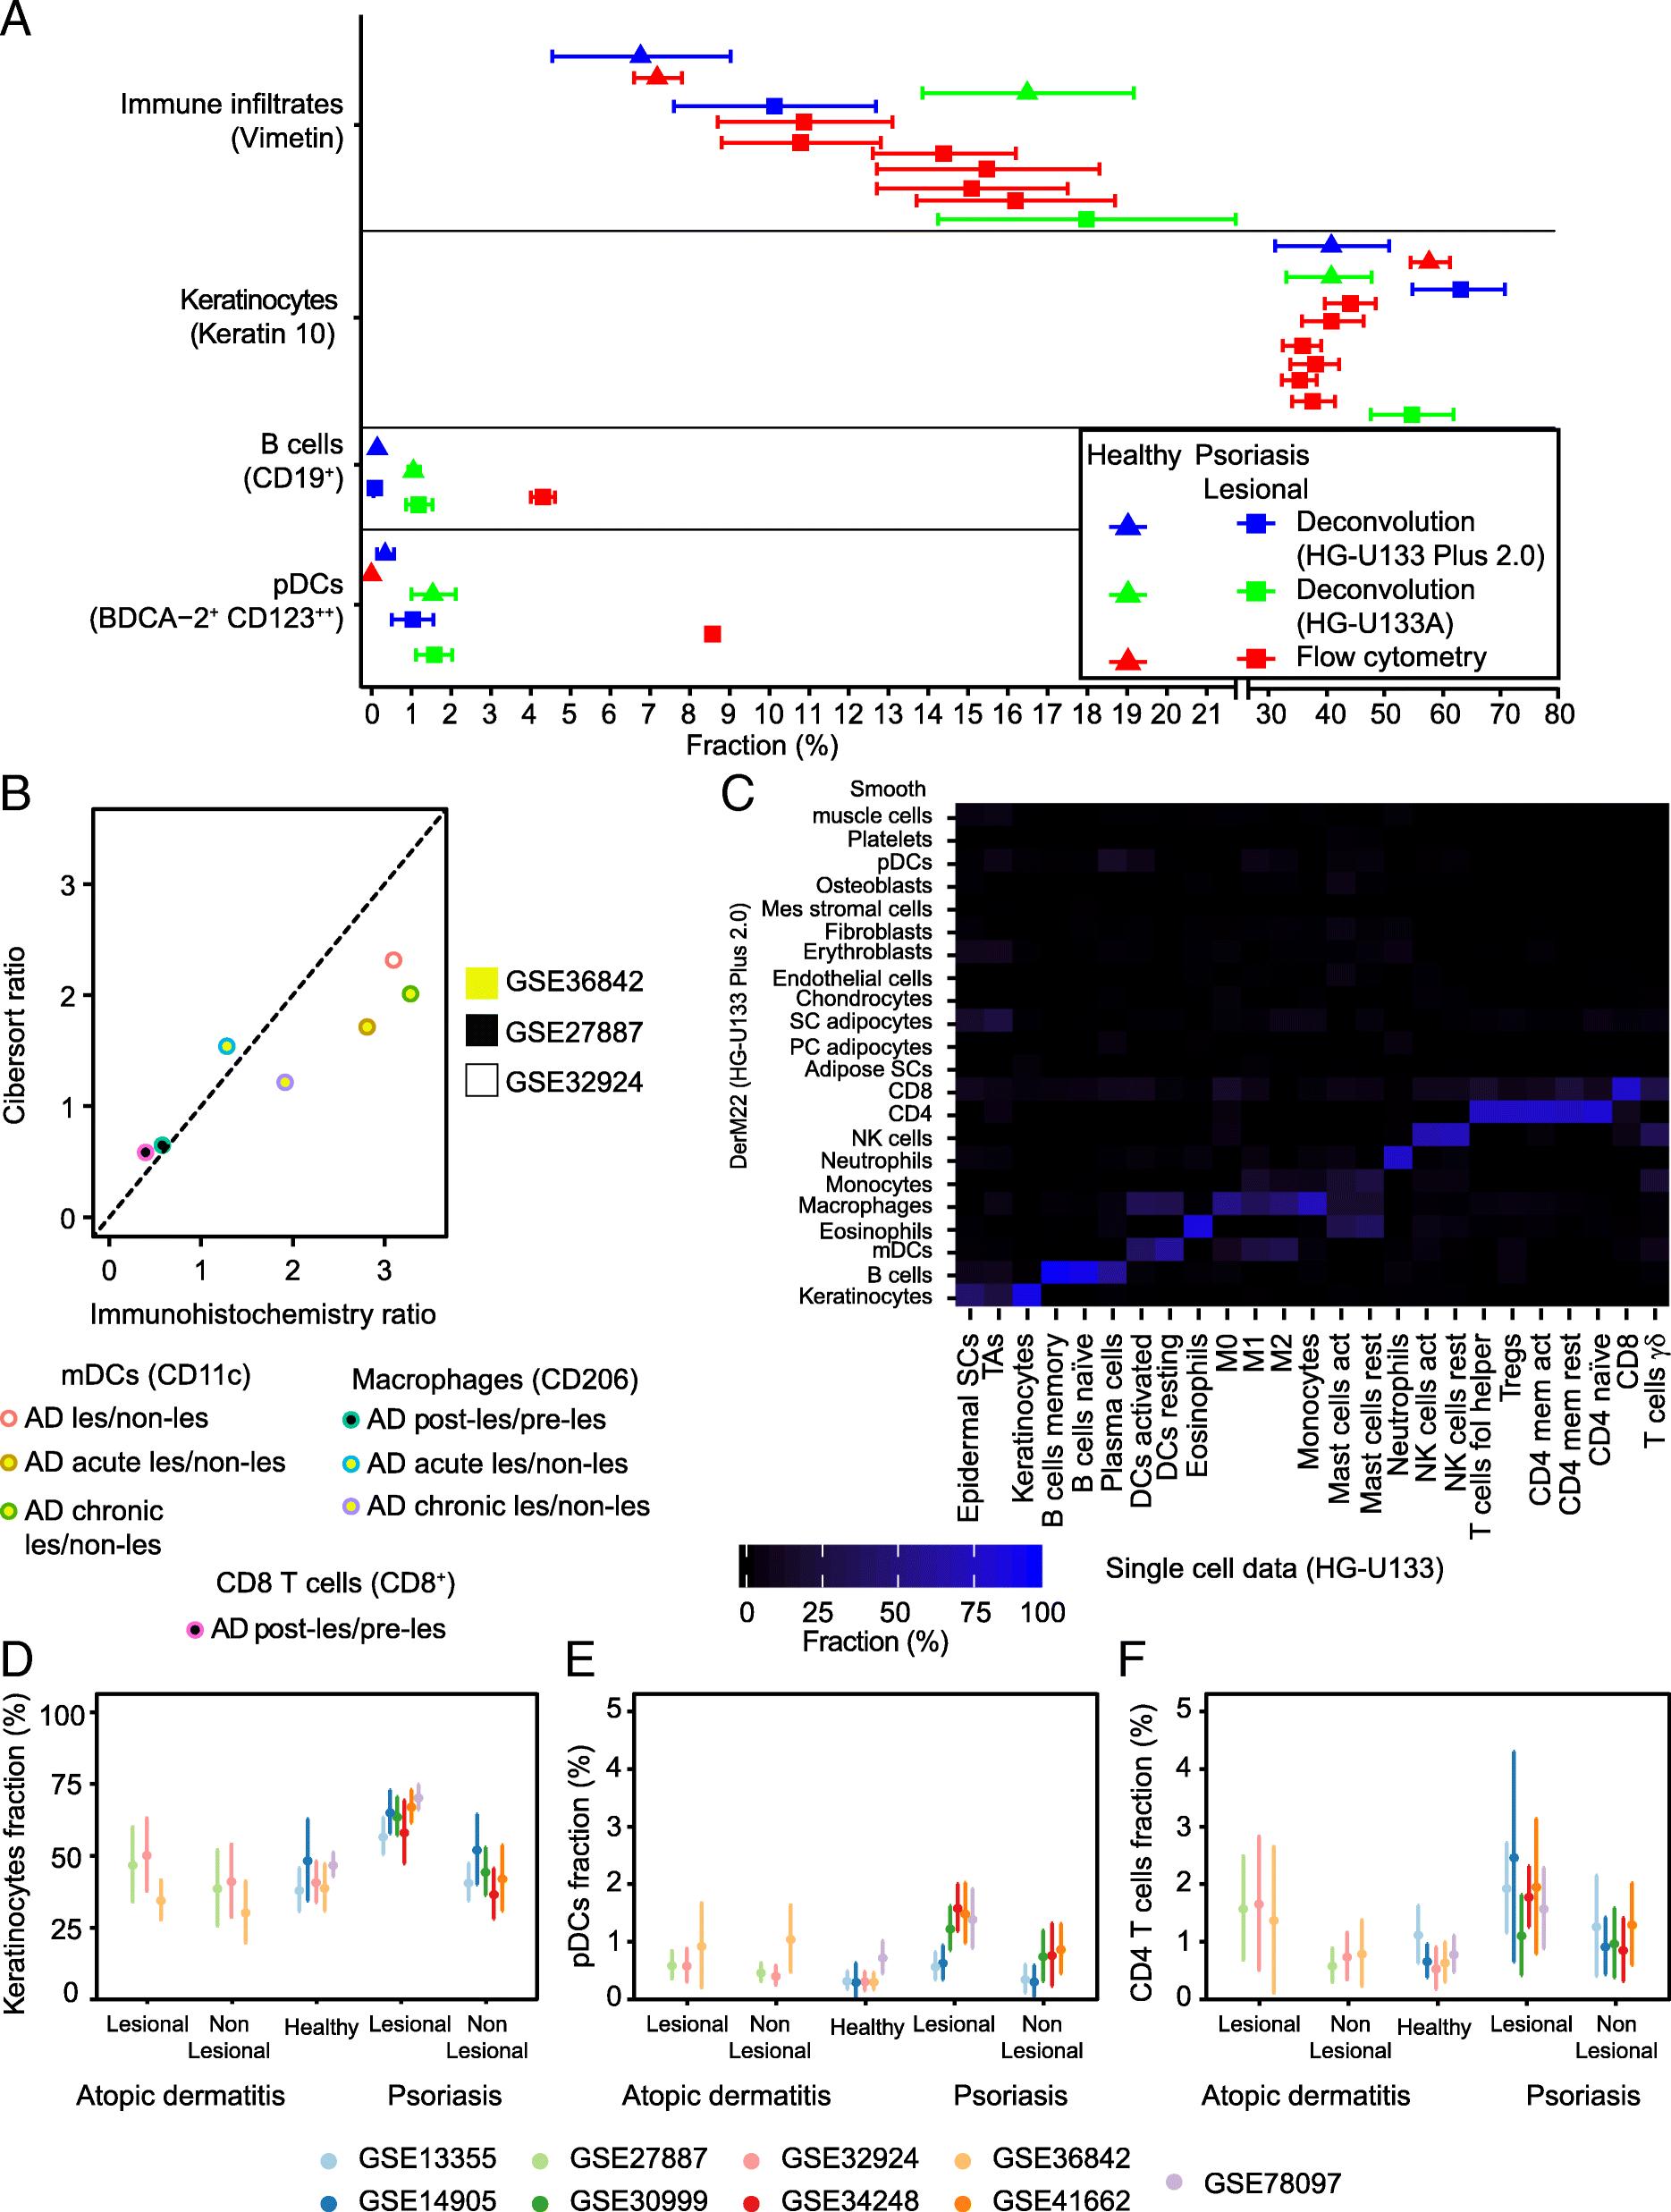 Characterization of disease-specific cellular abundance